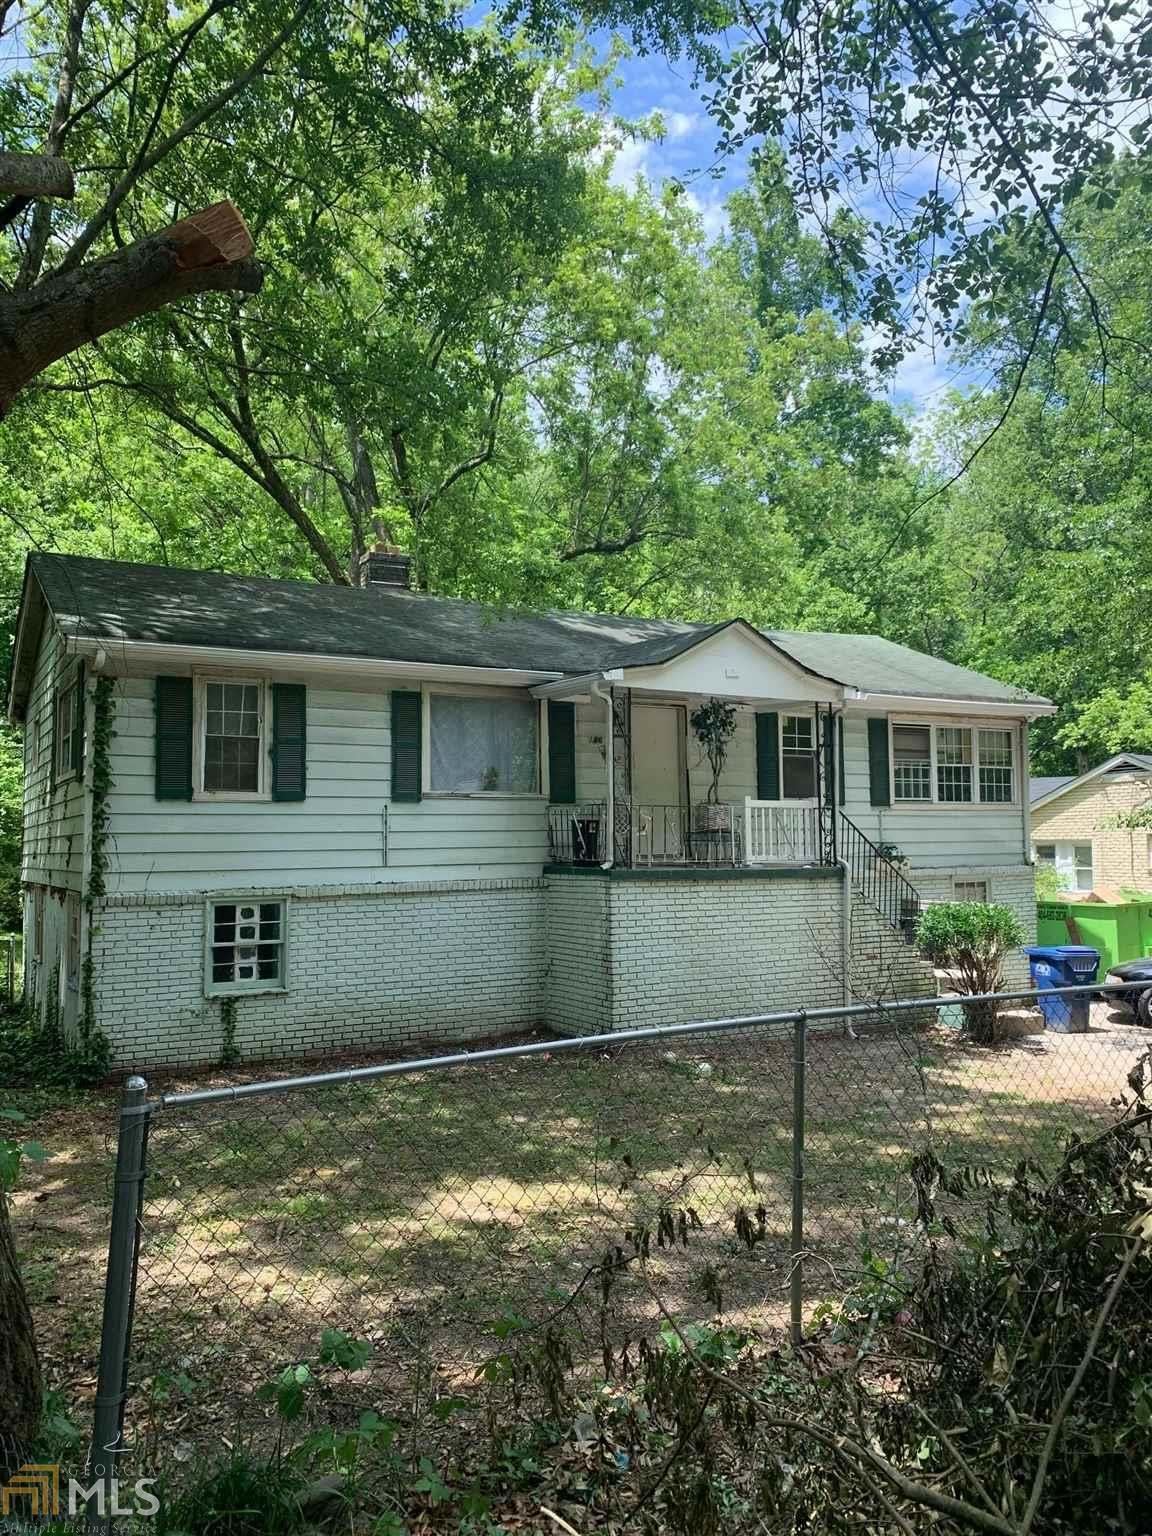 196 Wadley St, Atlanta, GA 30314 - #: 8787377